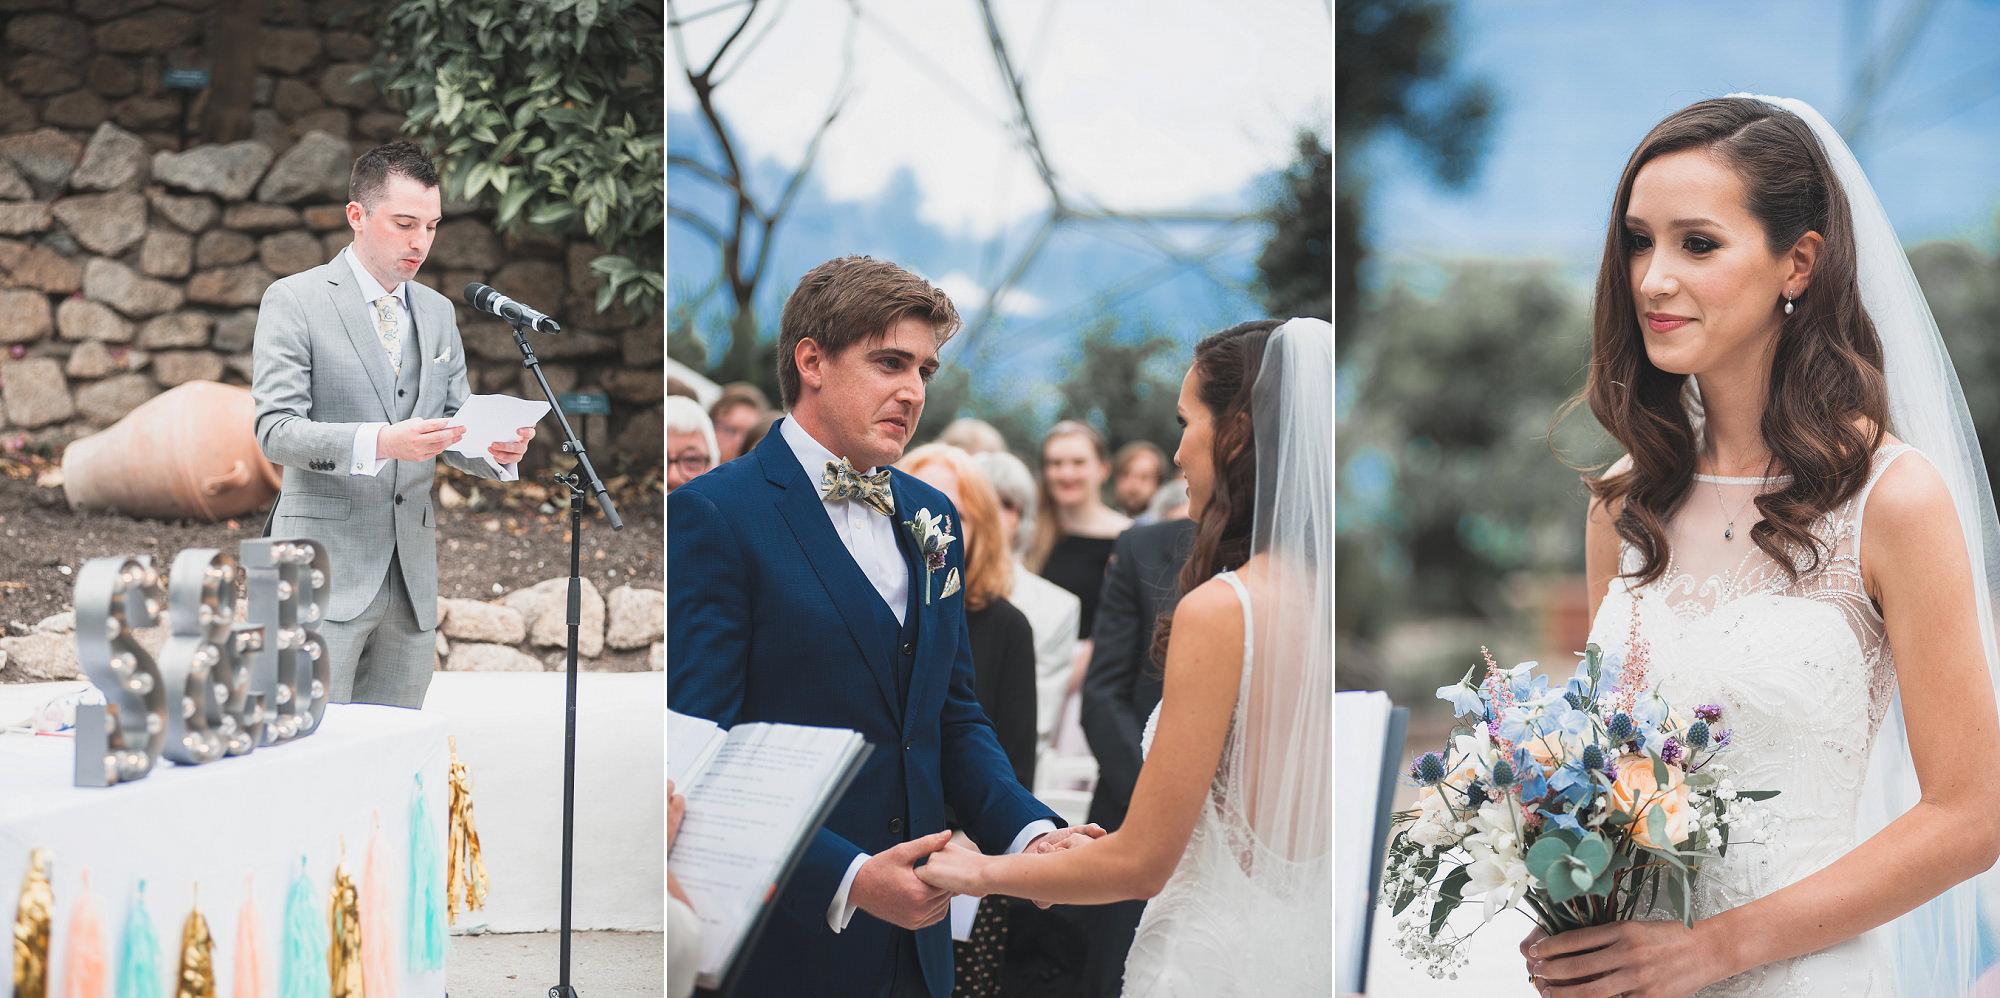 Eden Project Wedding, Cornwall Wedding Photographer